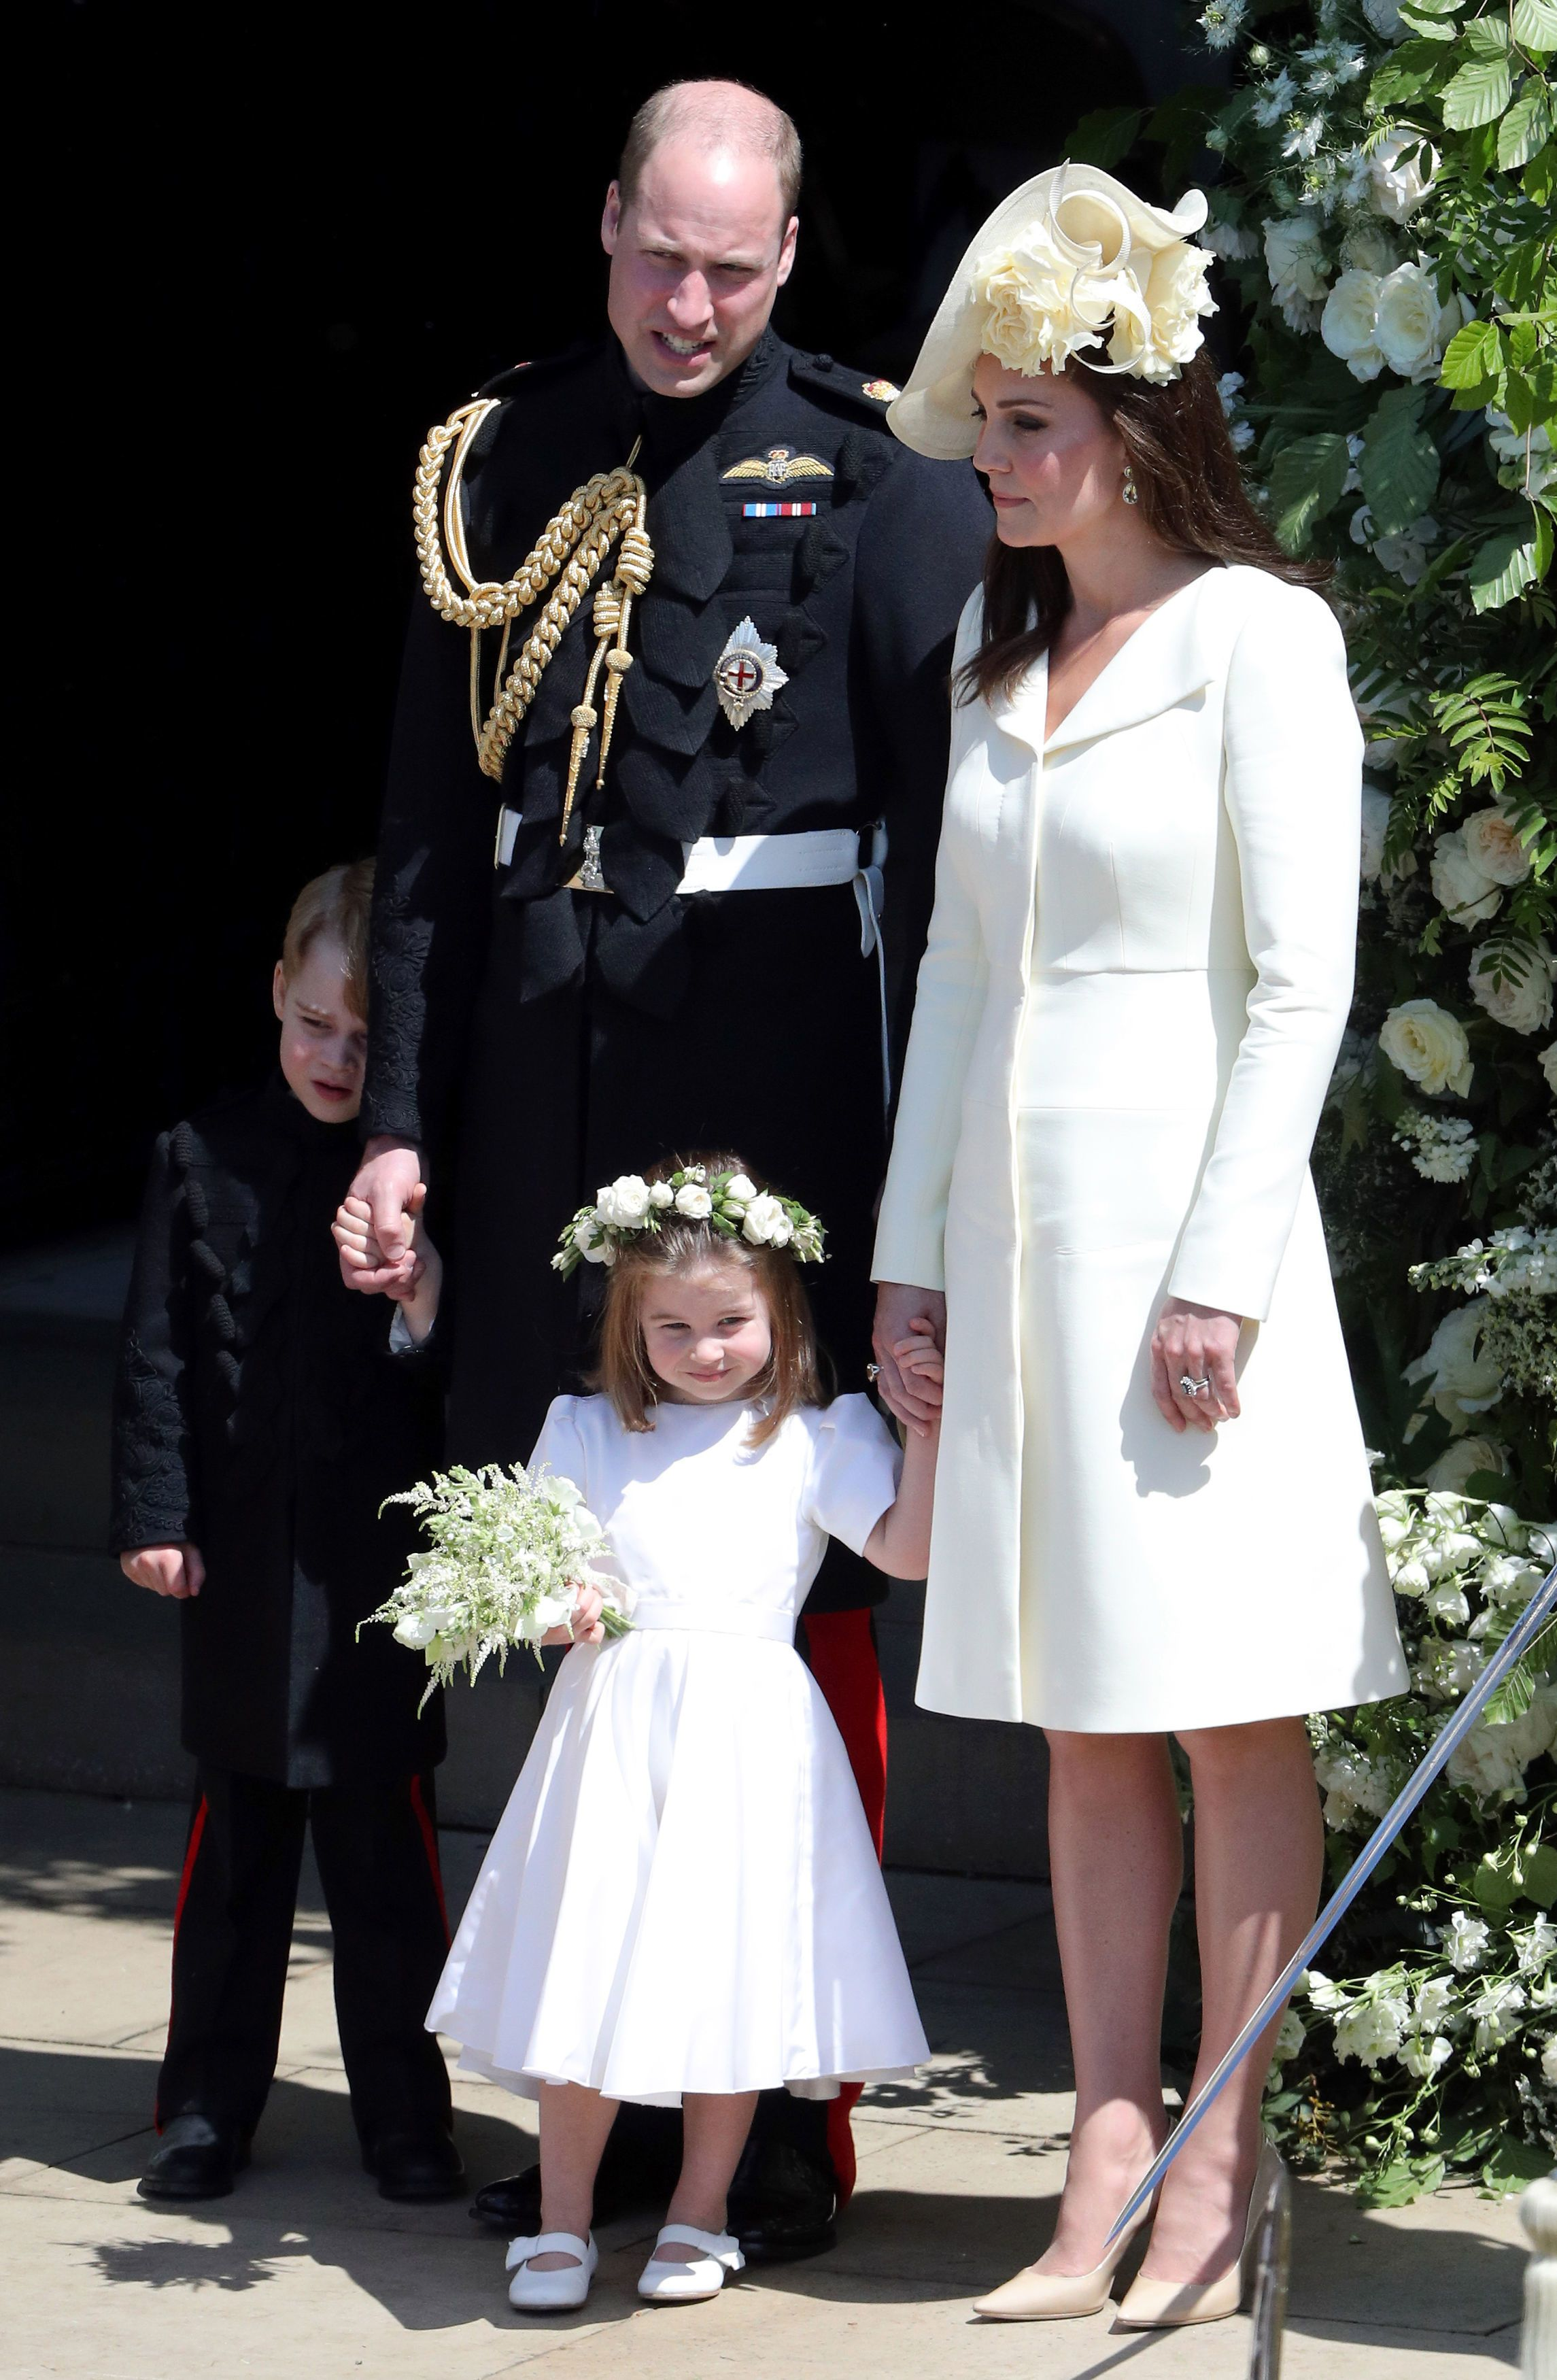 Kate Middletons Dress At The Royal Wedding 2018 Revealed Kate